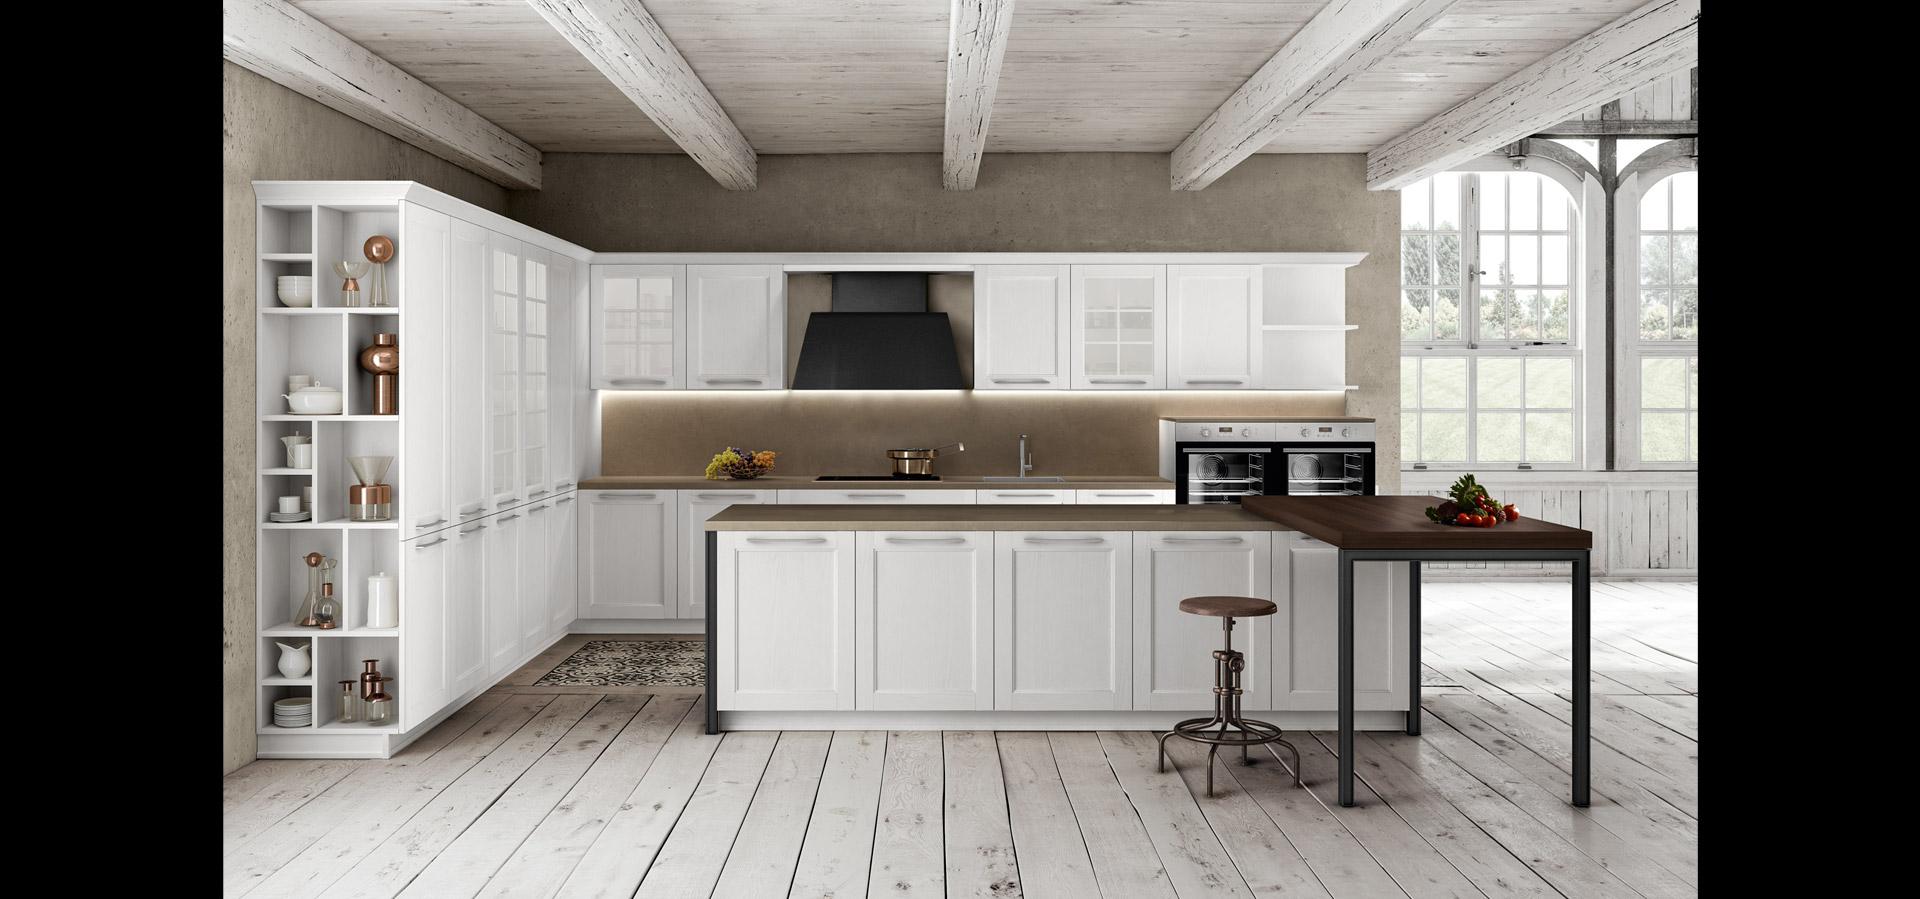 Cucina classica e moderna Made in Italy | Talìa_02 | MITON Cucine